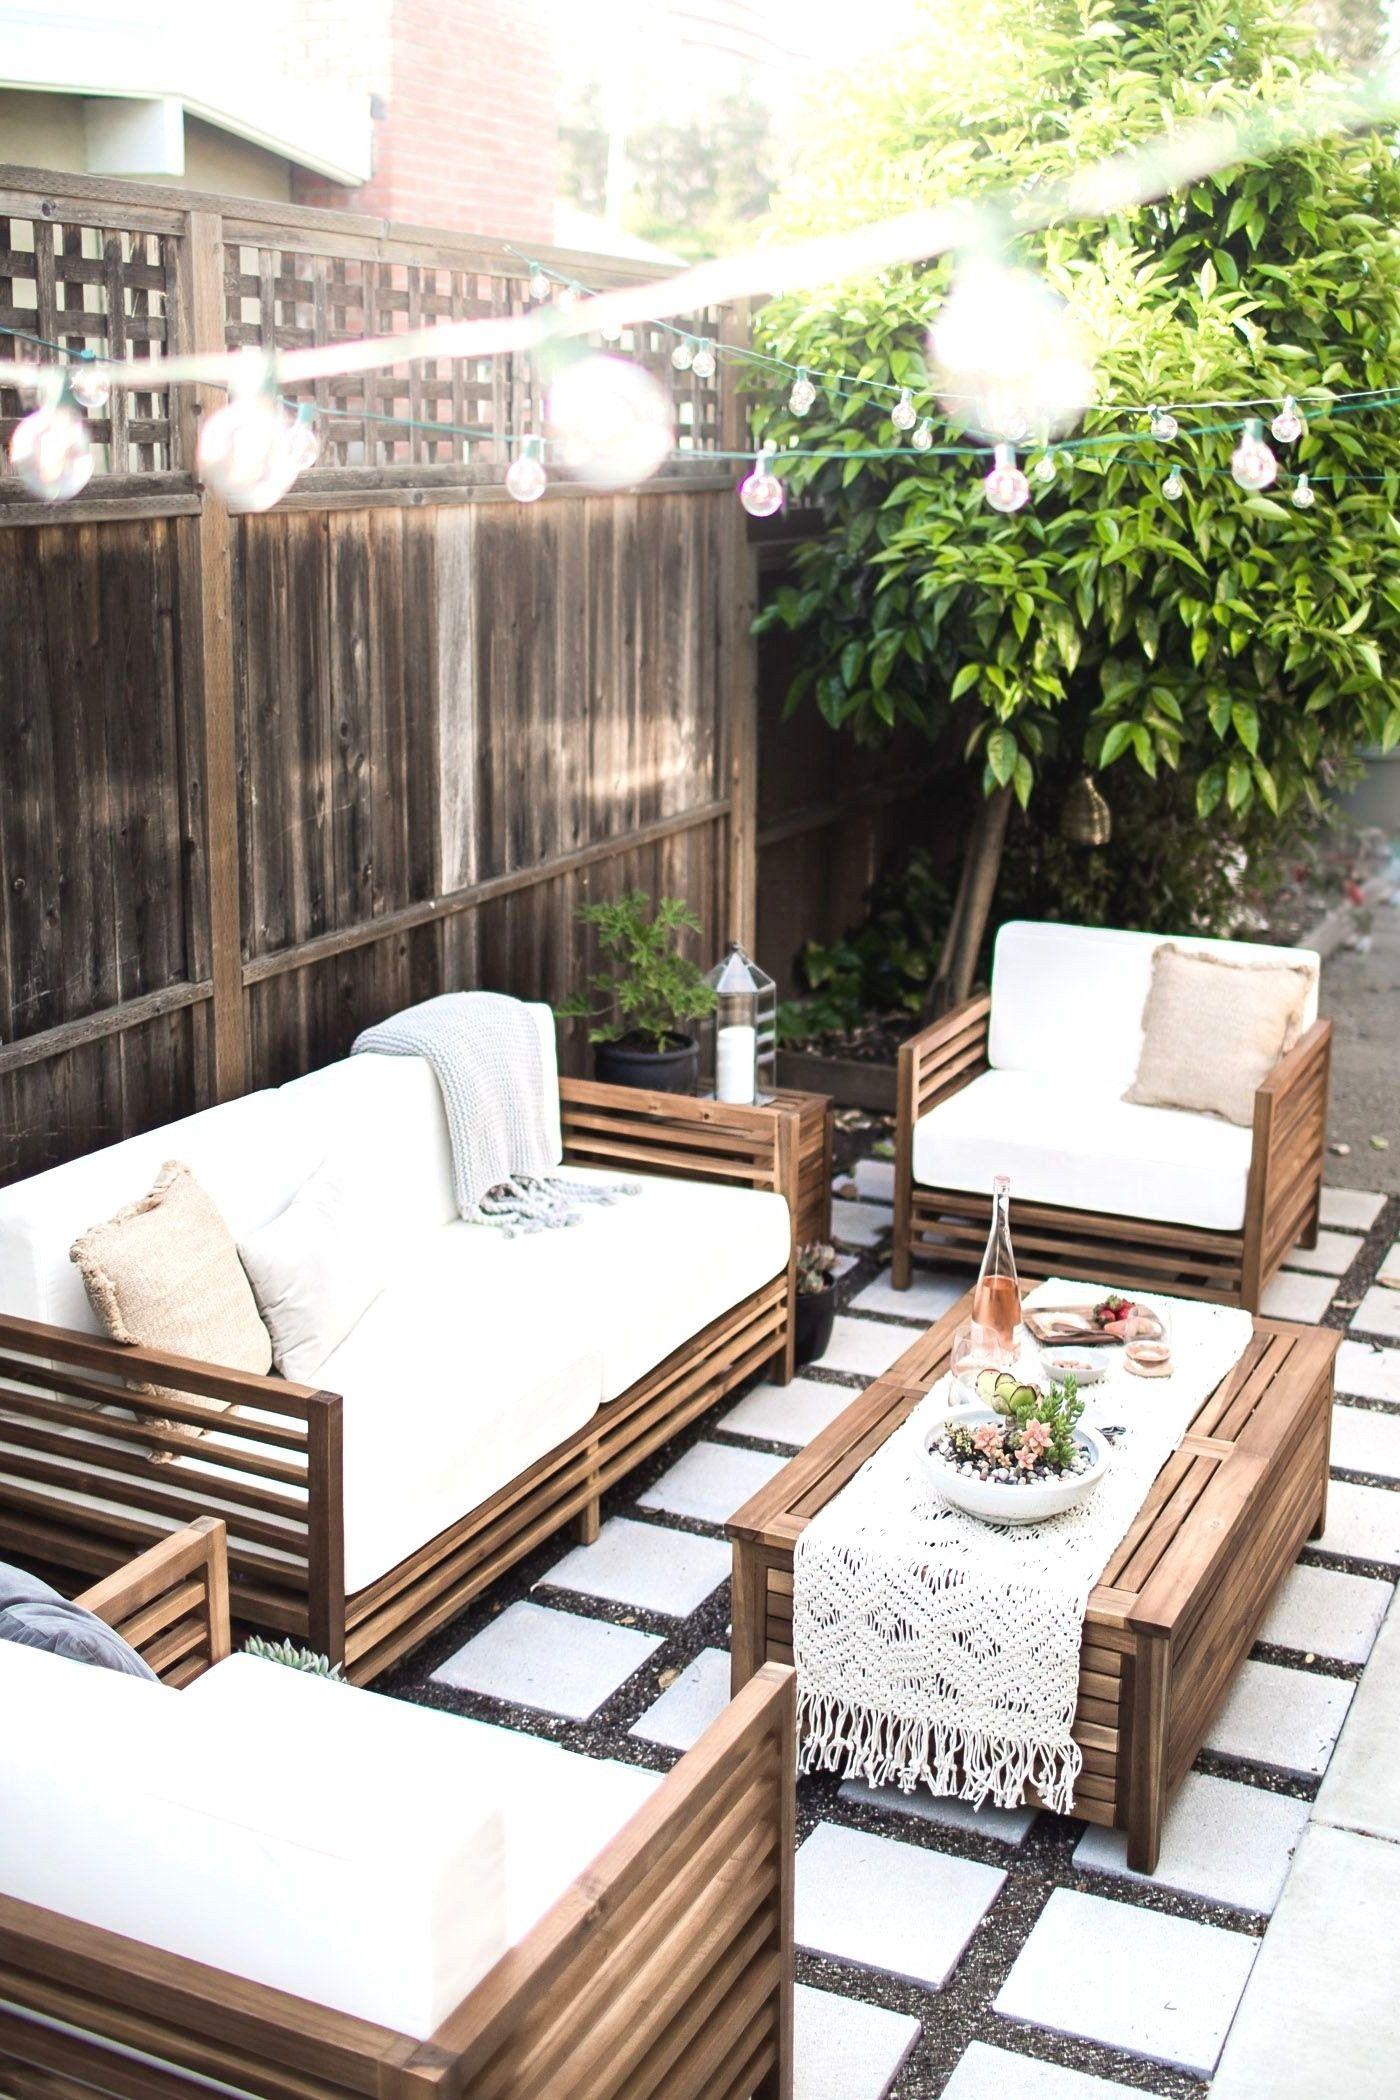 9 Brilliant Outdoor Room Edmonton Ideas #OutdoorRoom  Welcome to